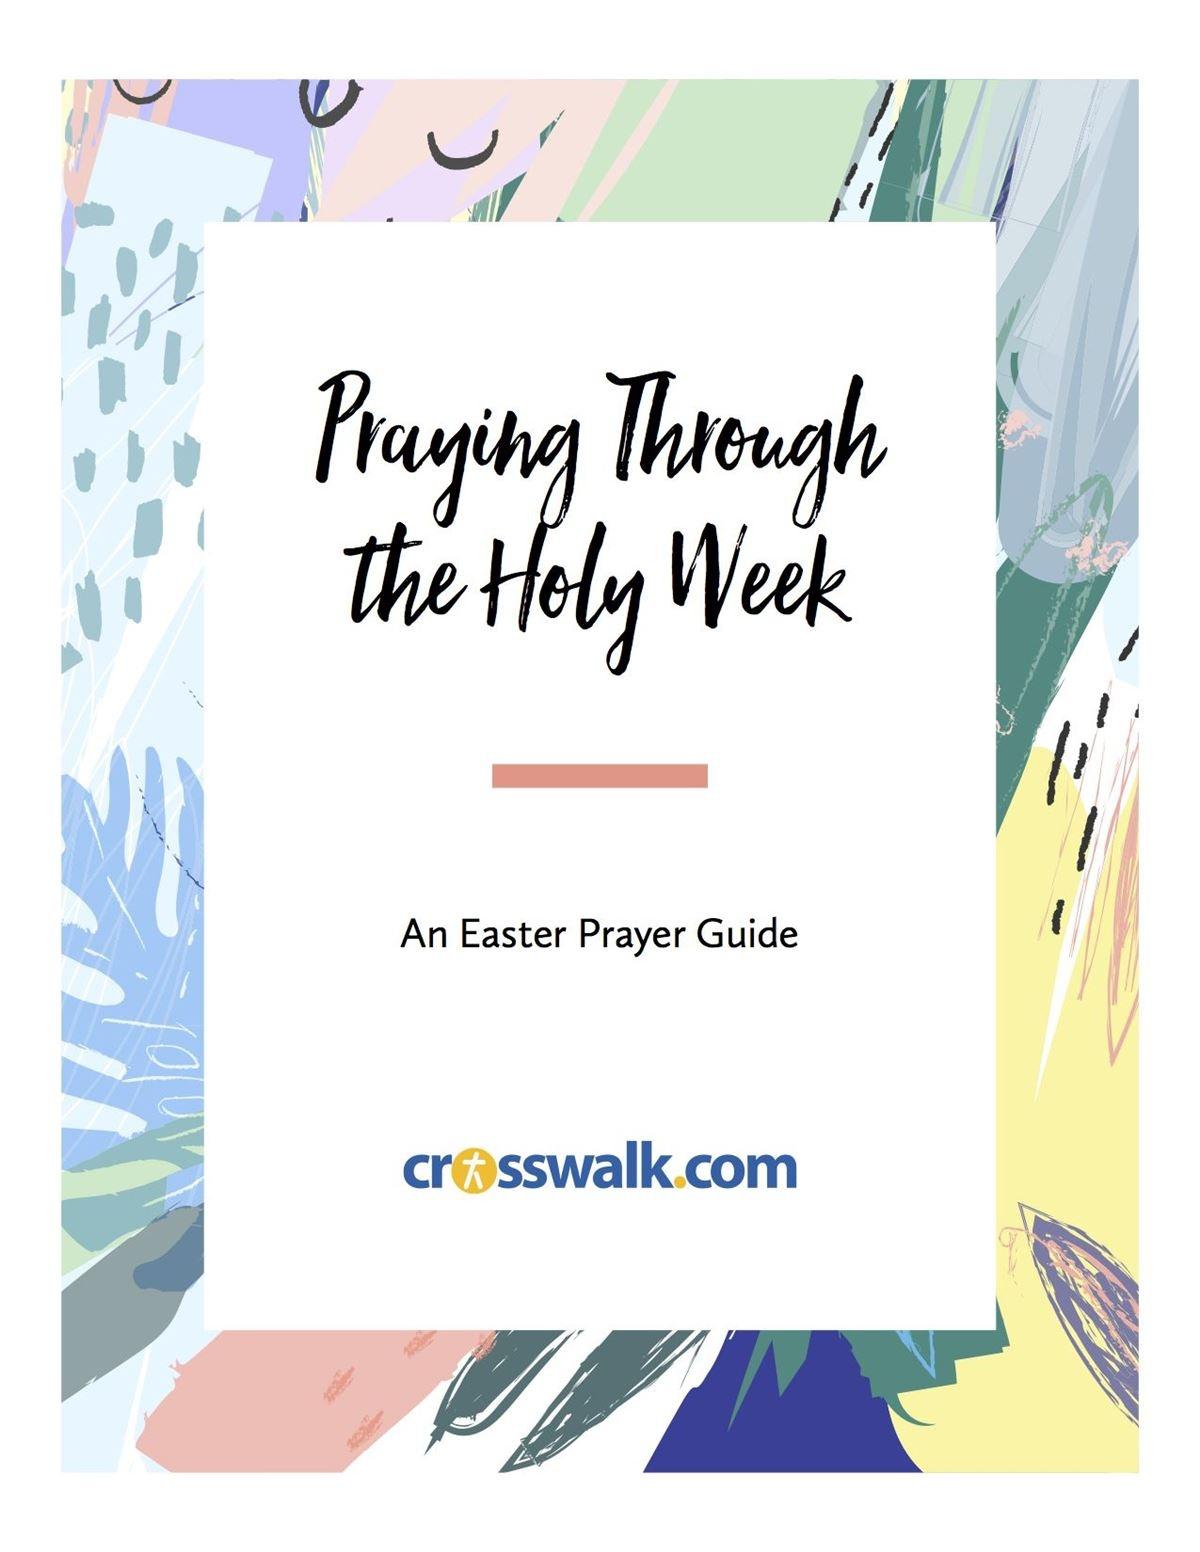 Download Free Printables - Beautiful Inspiring Christian Images - Free Printable Christian Cards Online